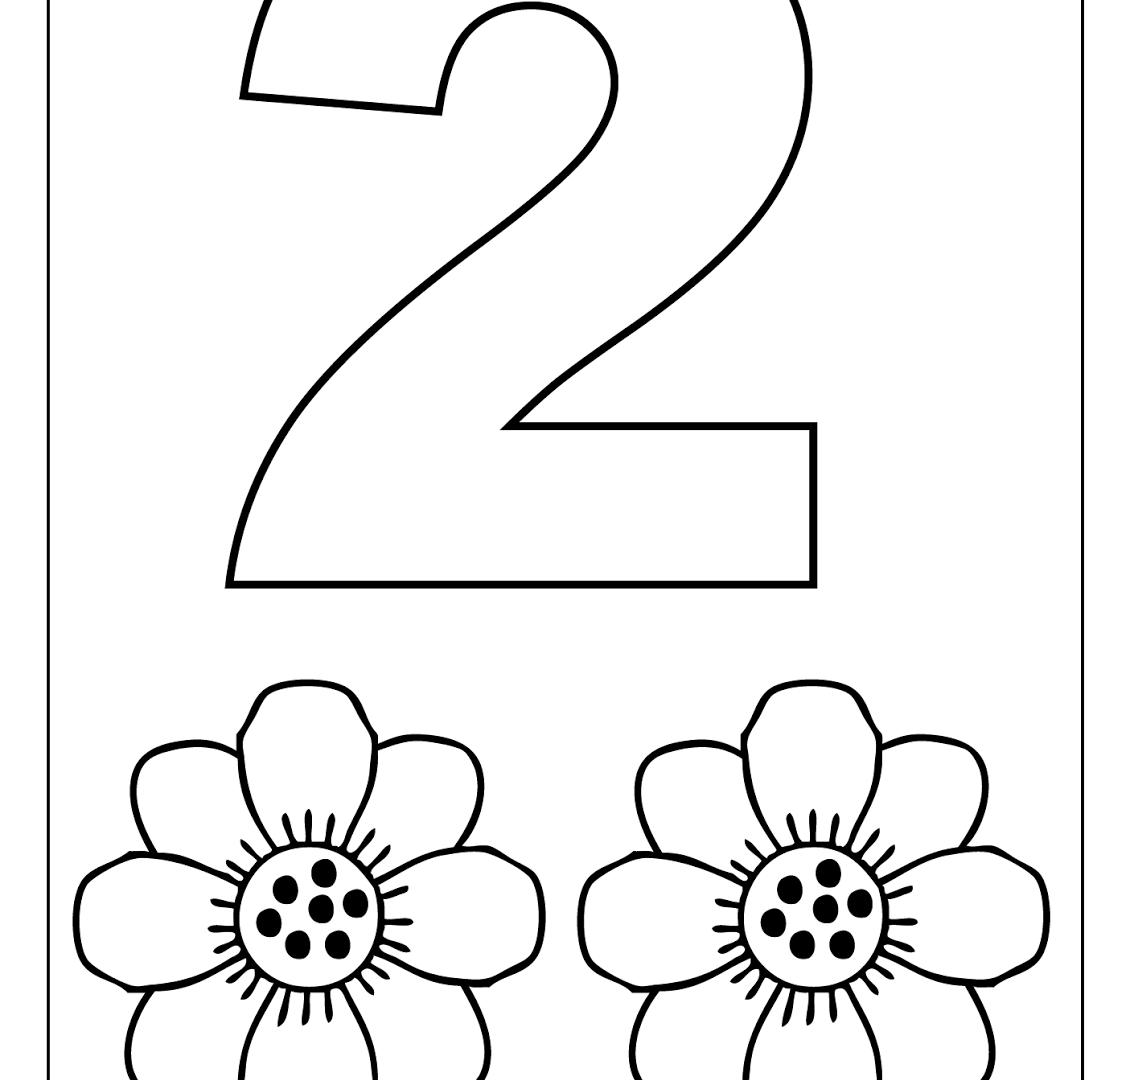 Drawing Worksheets For Preschool At Getdrawings